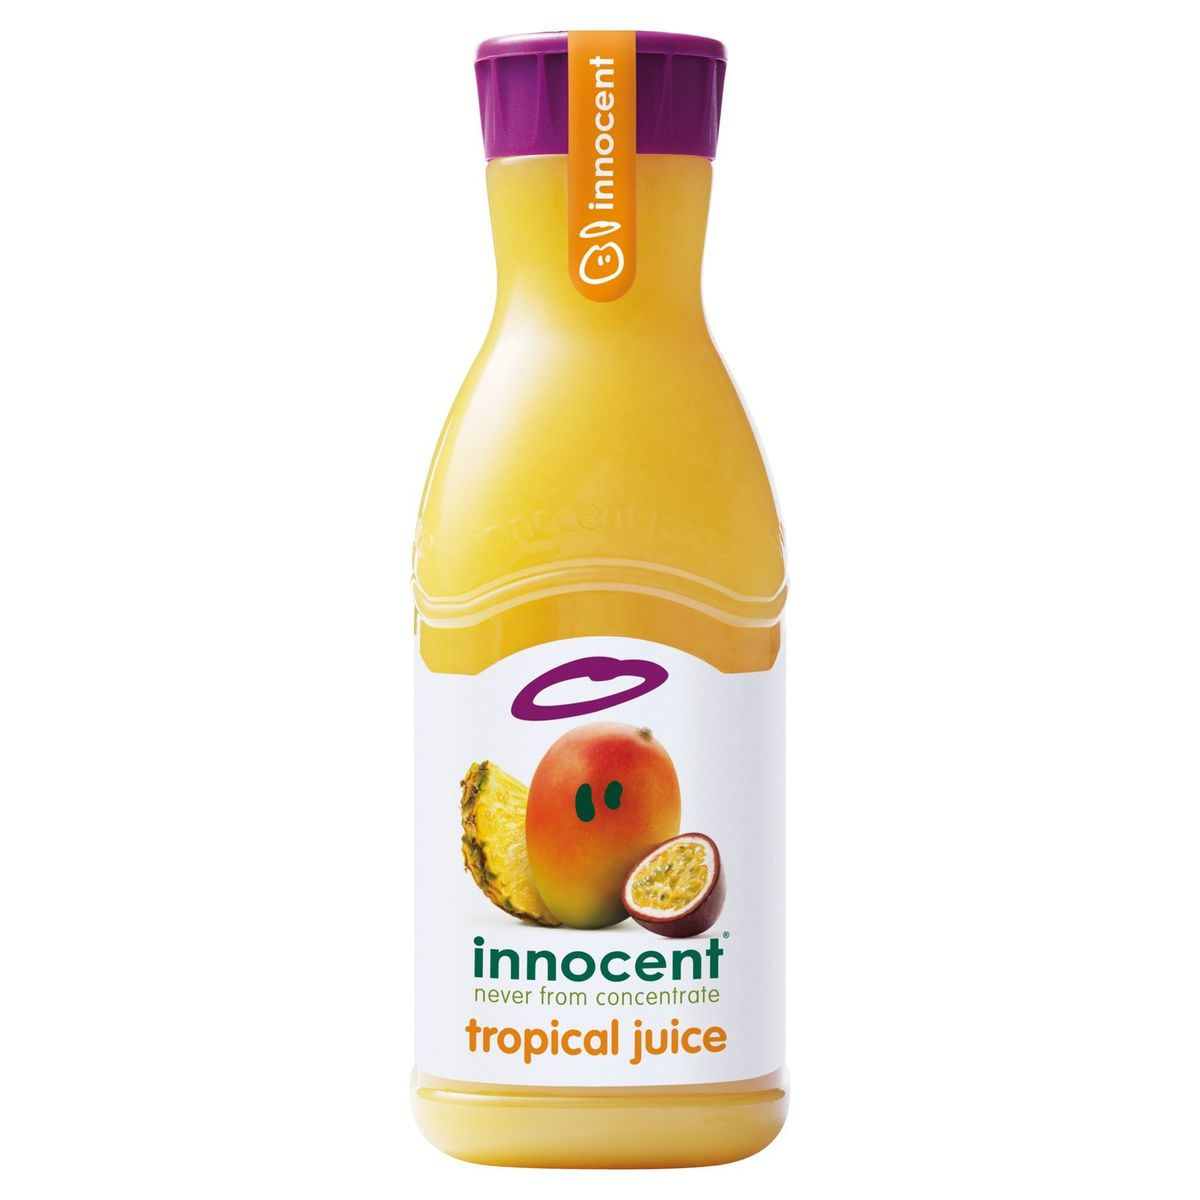 Innocent Tropical Juice 900 ml